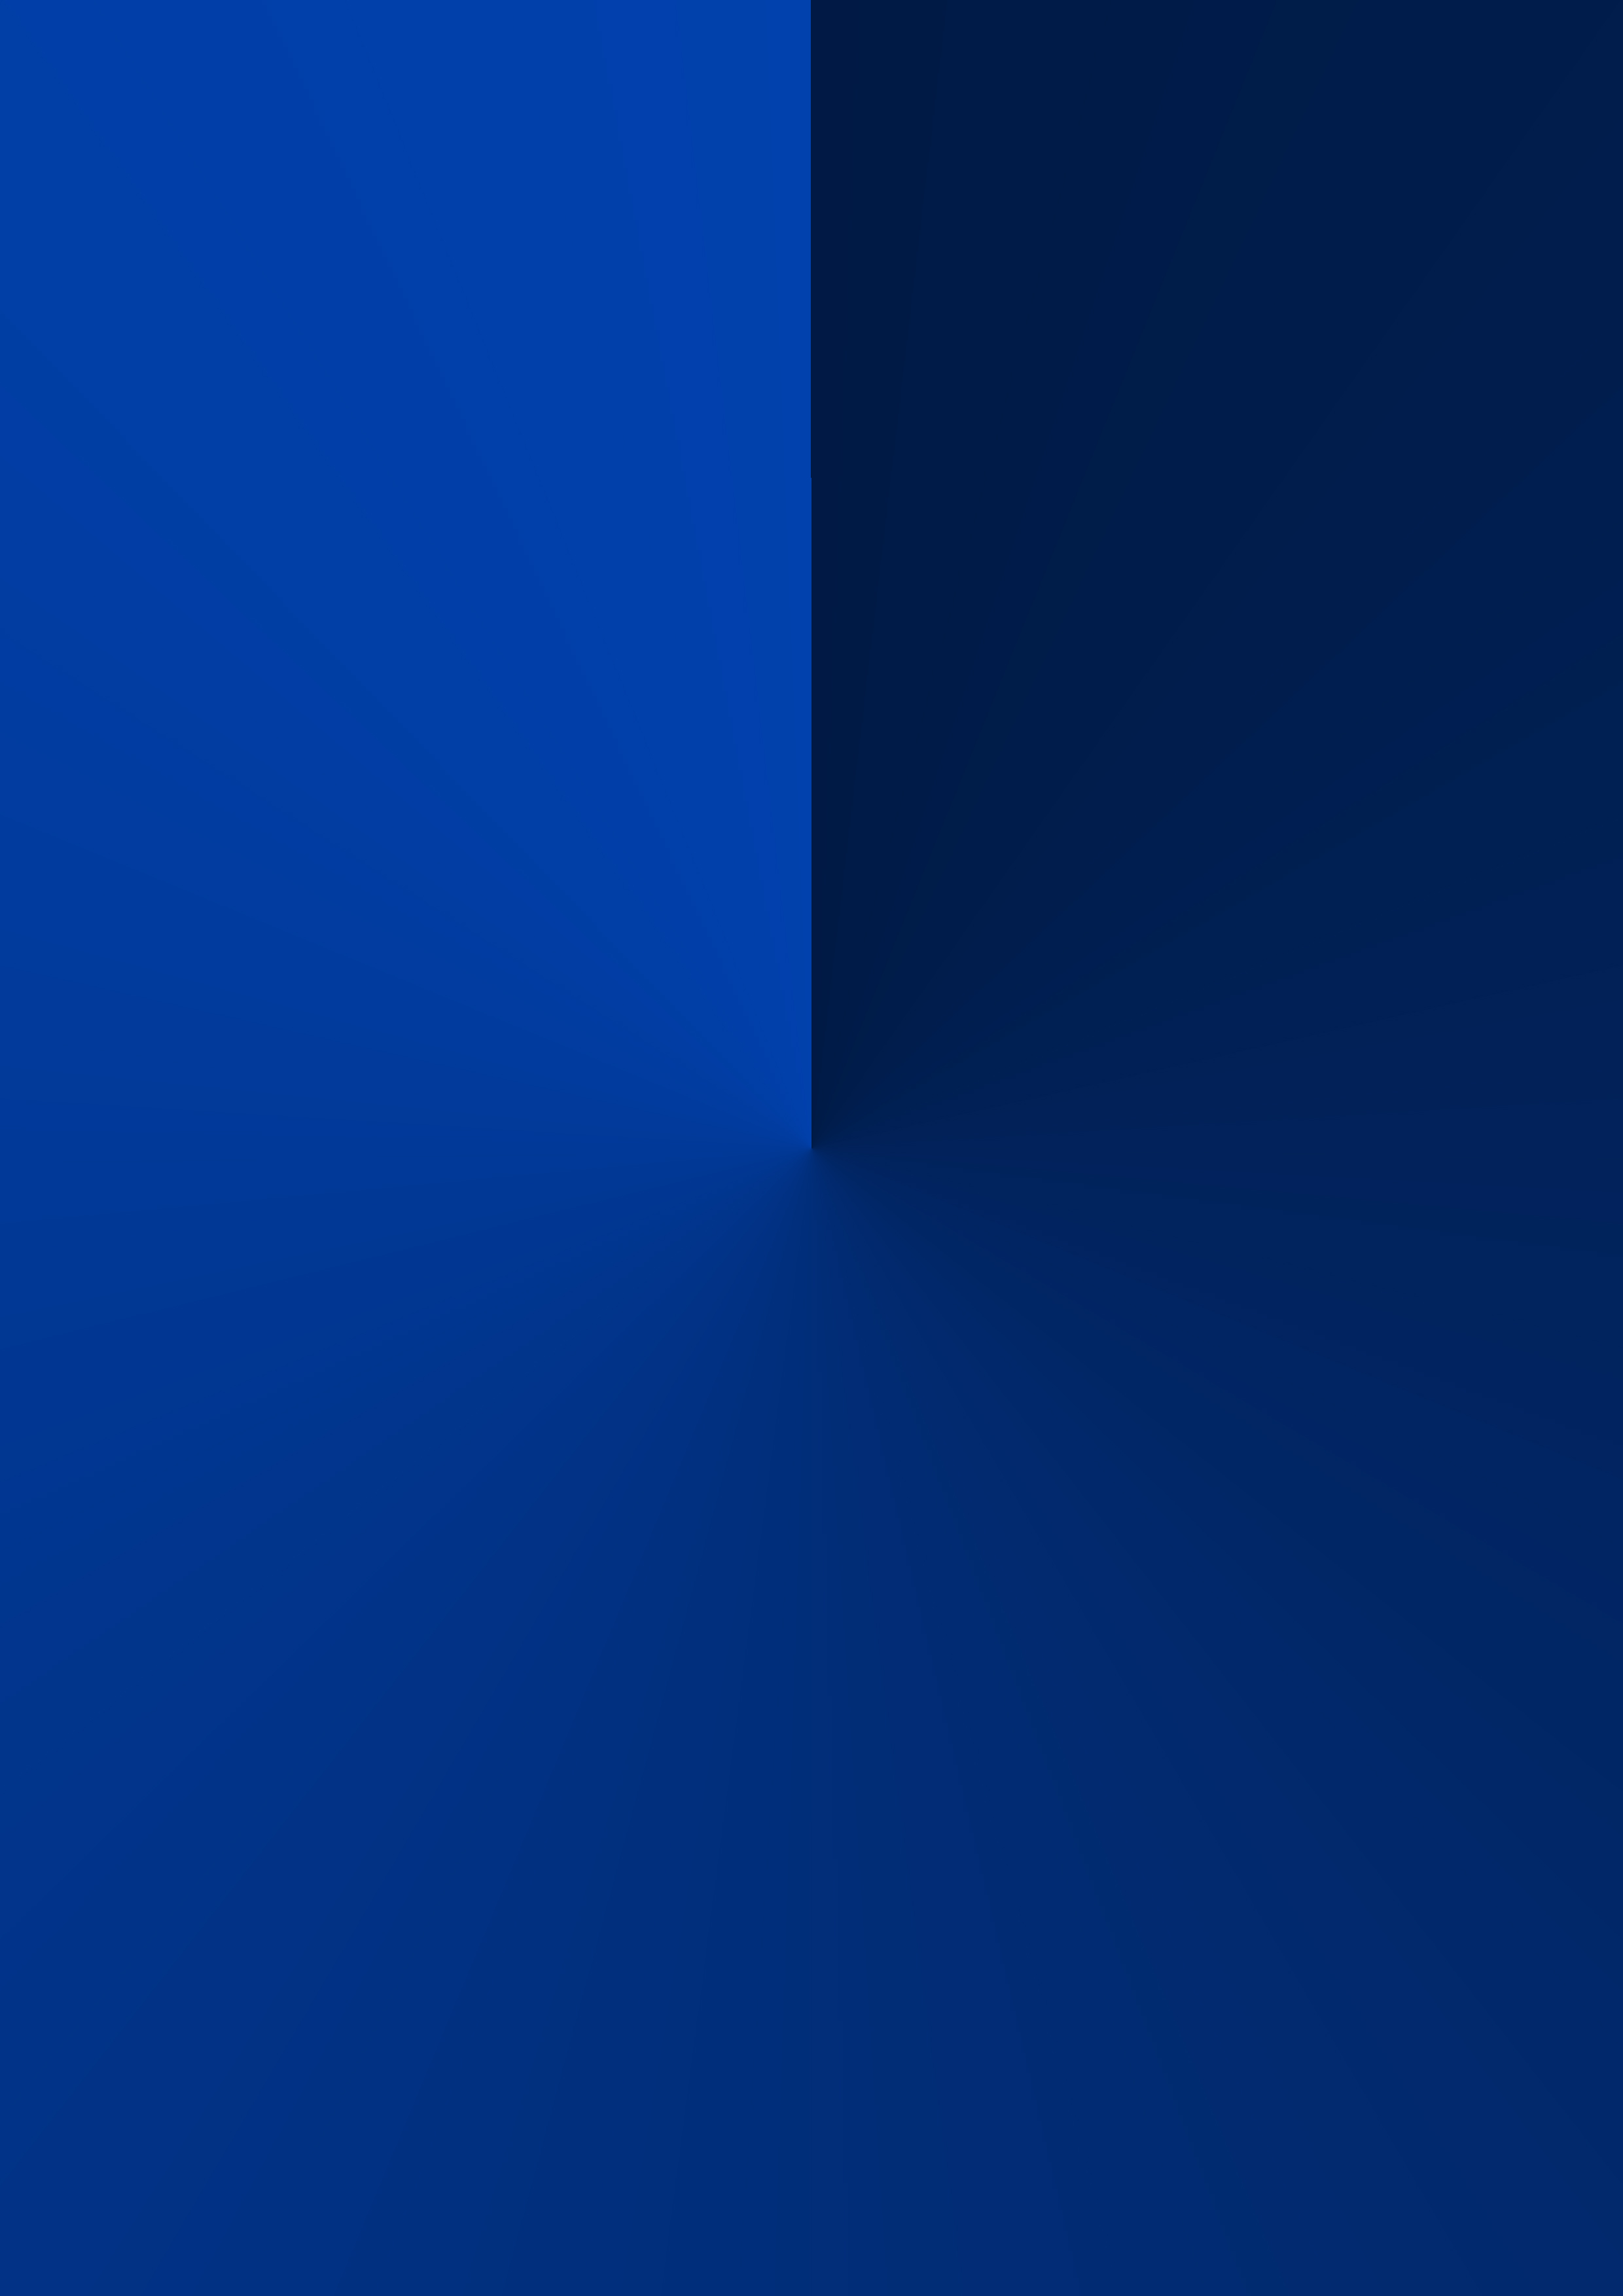 23.blue cover x.jpg